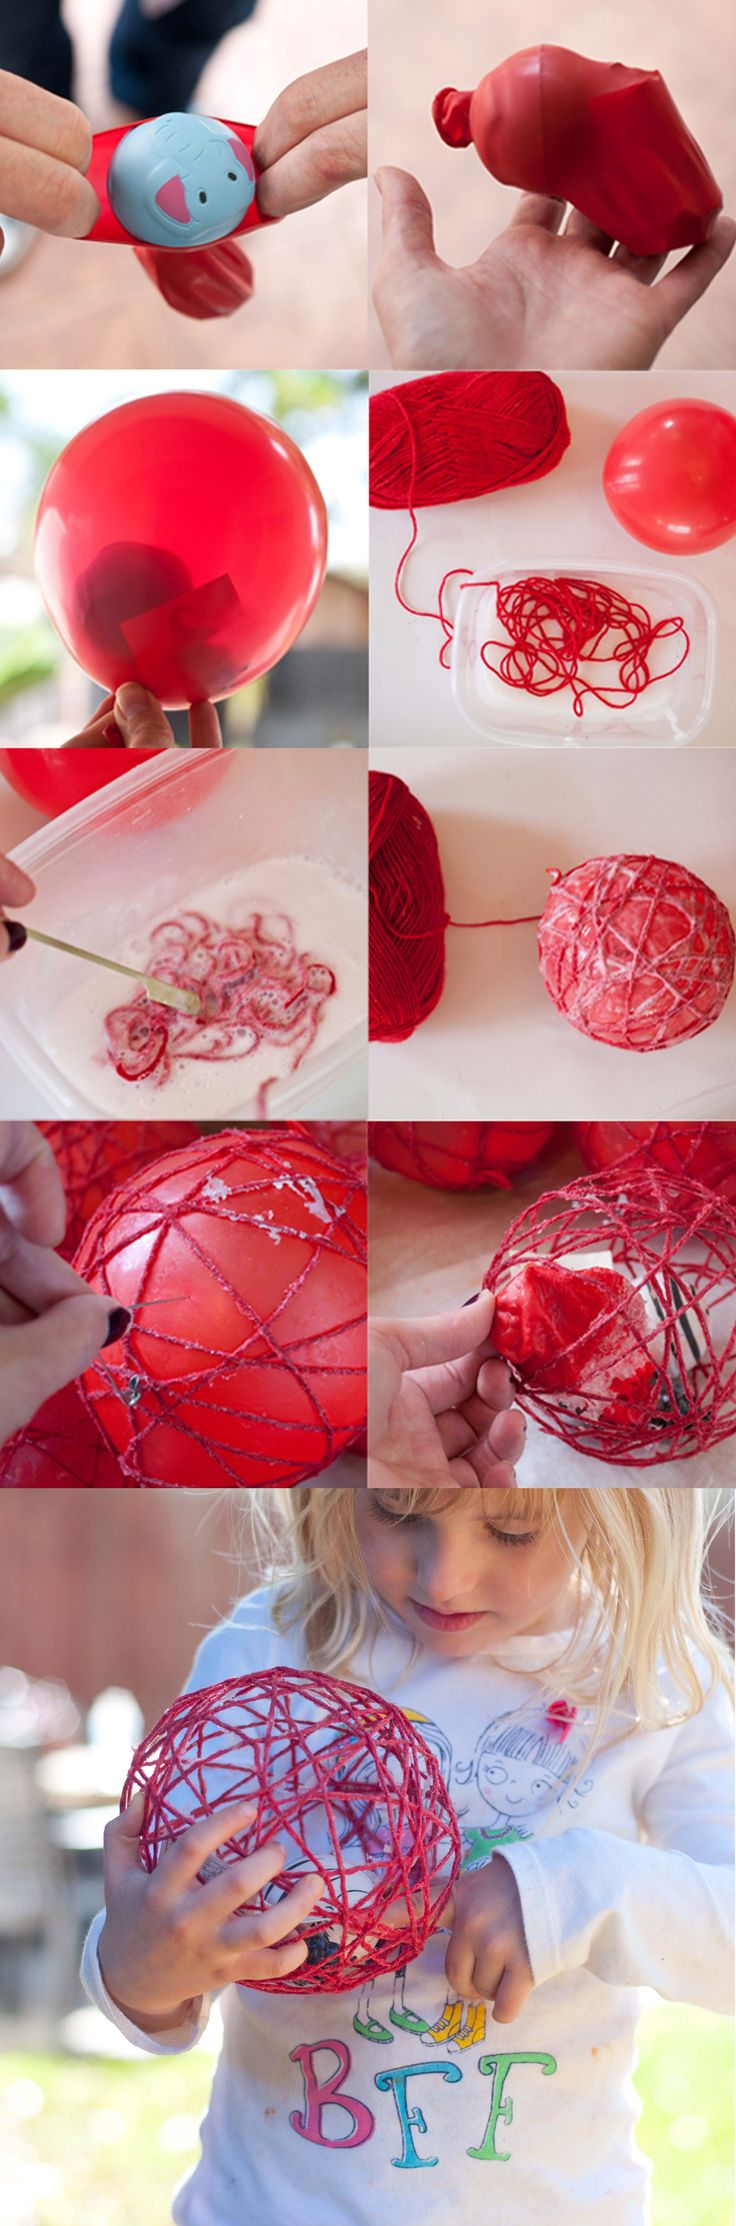 balloon collage 2